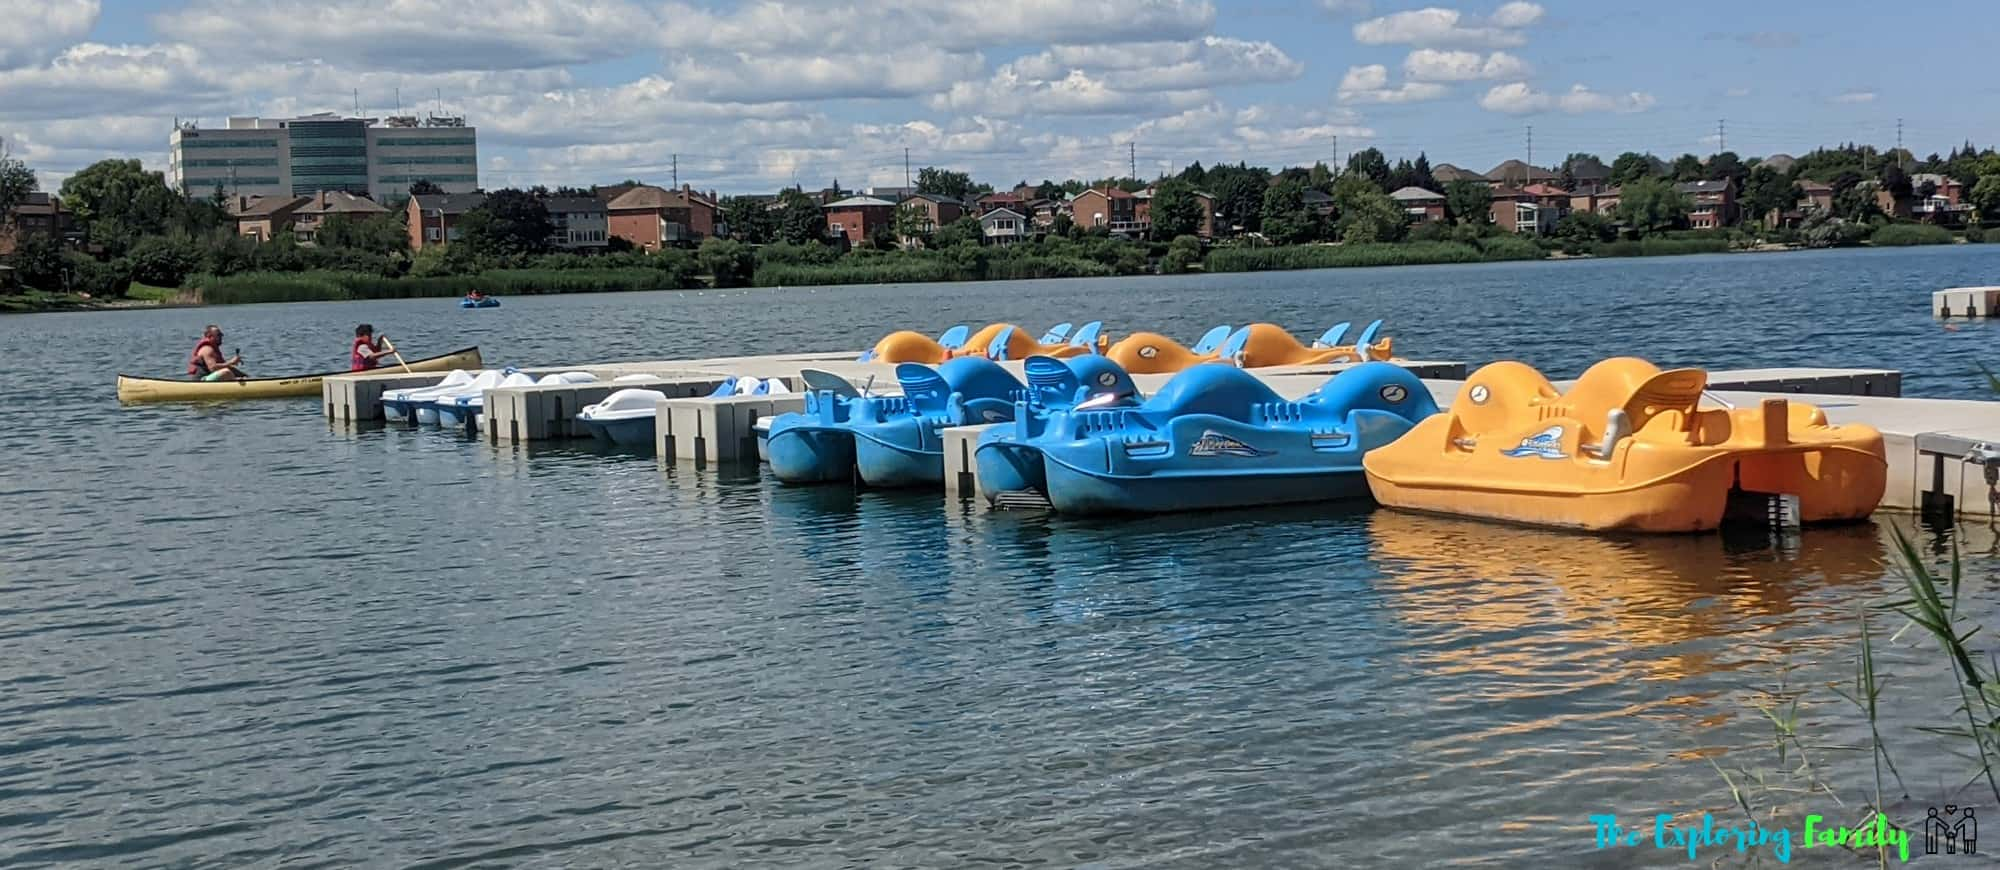 Professors Lake rentals paddle boats kayaks